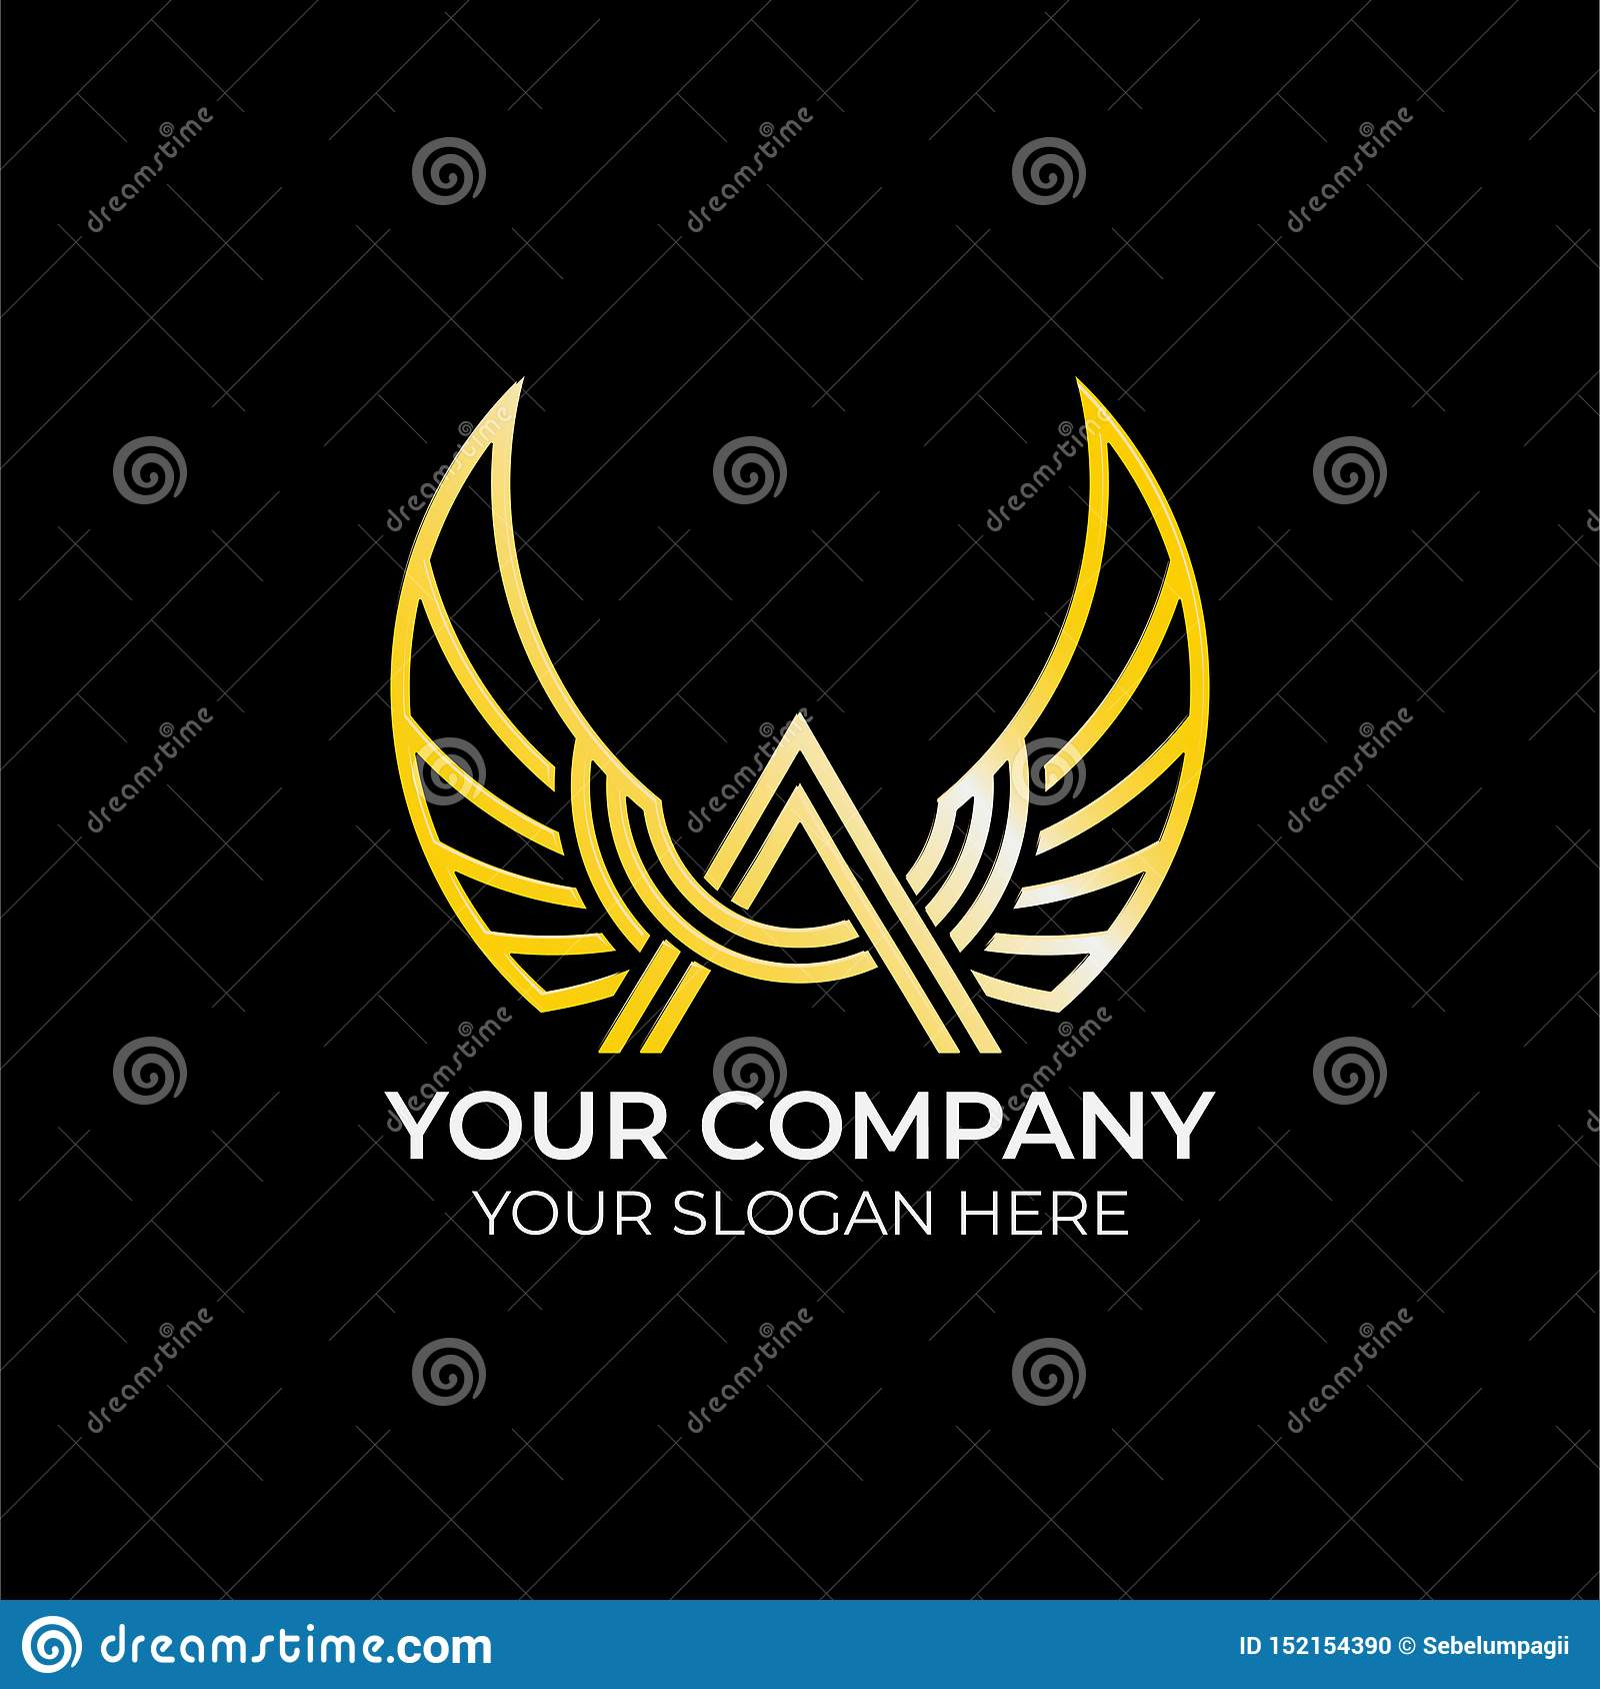 Luxury wing logo design